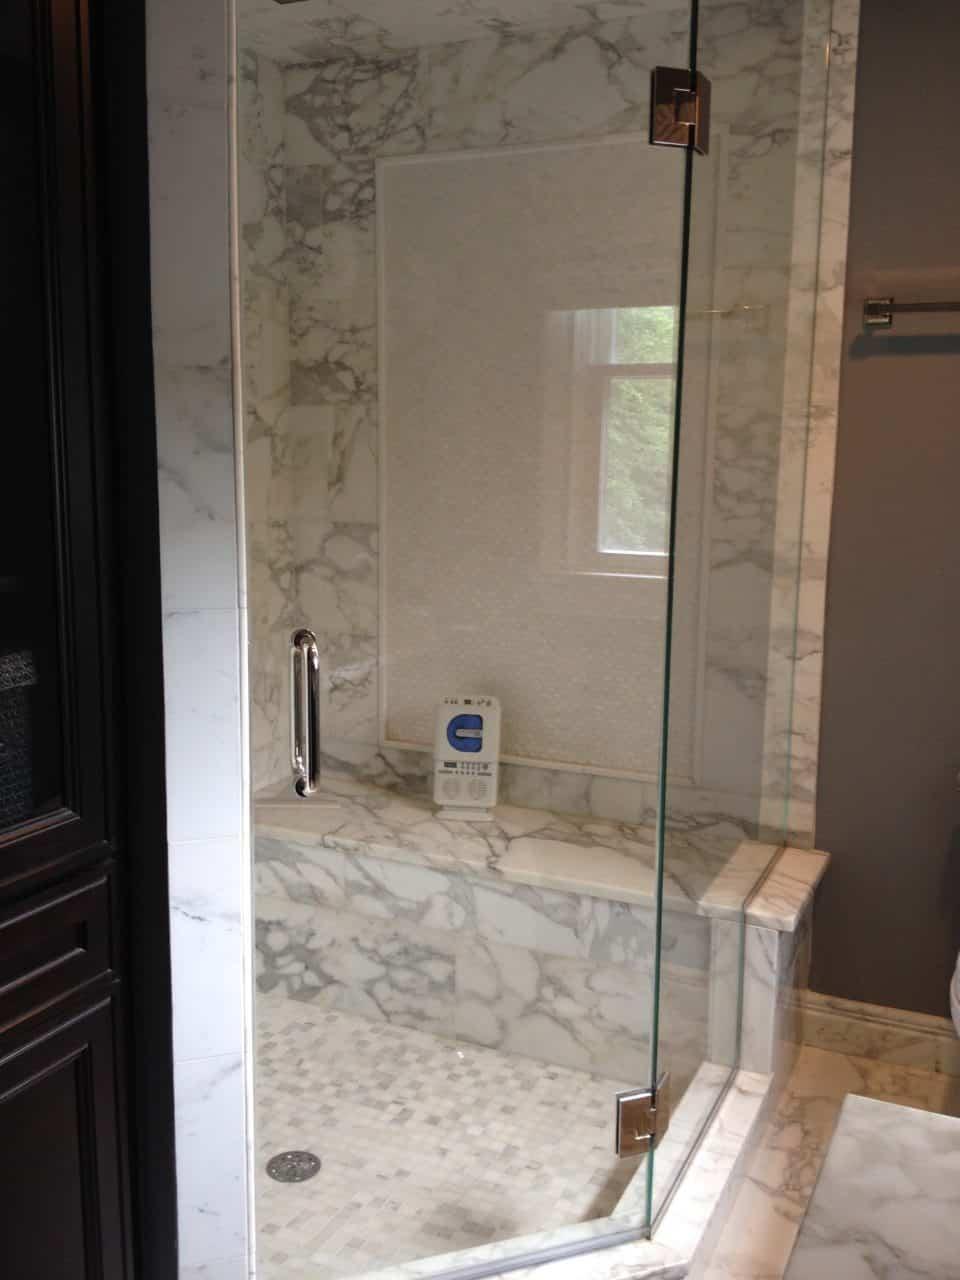 Nj home remodeling pearl bathroom trade mark design